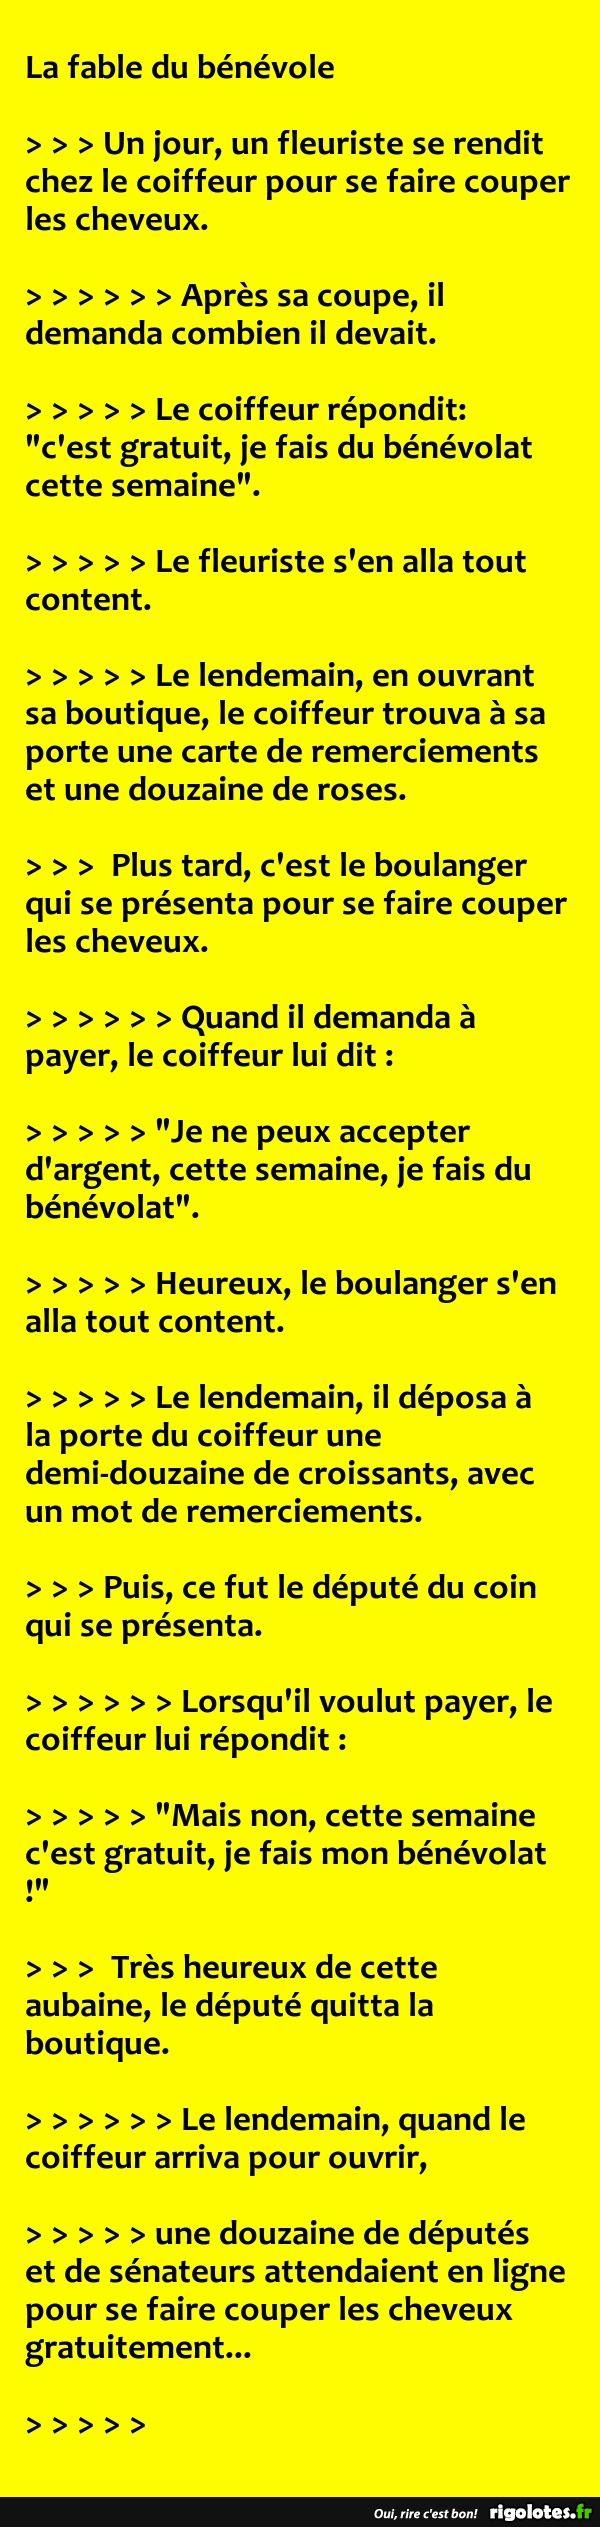 La fable du bénévole... - RIGOLOTES.fr